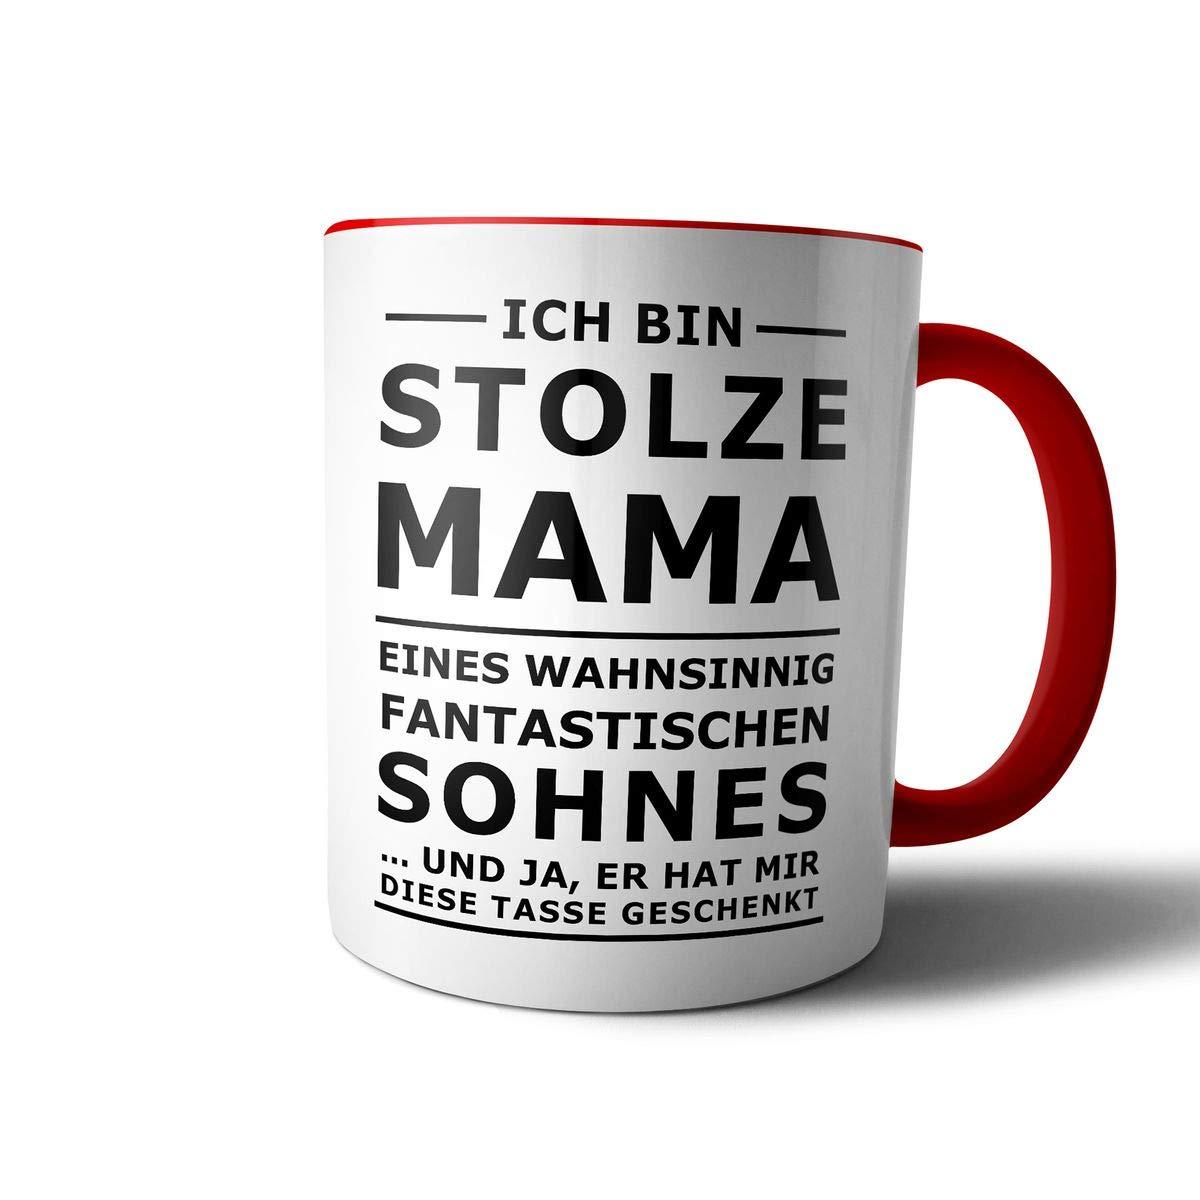 creativgravur® Tasse mit Spruch STOLZER PAPA, STOLZE MAMA Kaffeetasse Kaffeebecher Kaffeepot Frühstückstasse Bürotasse, Motiv:Motiv 11 Bild